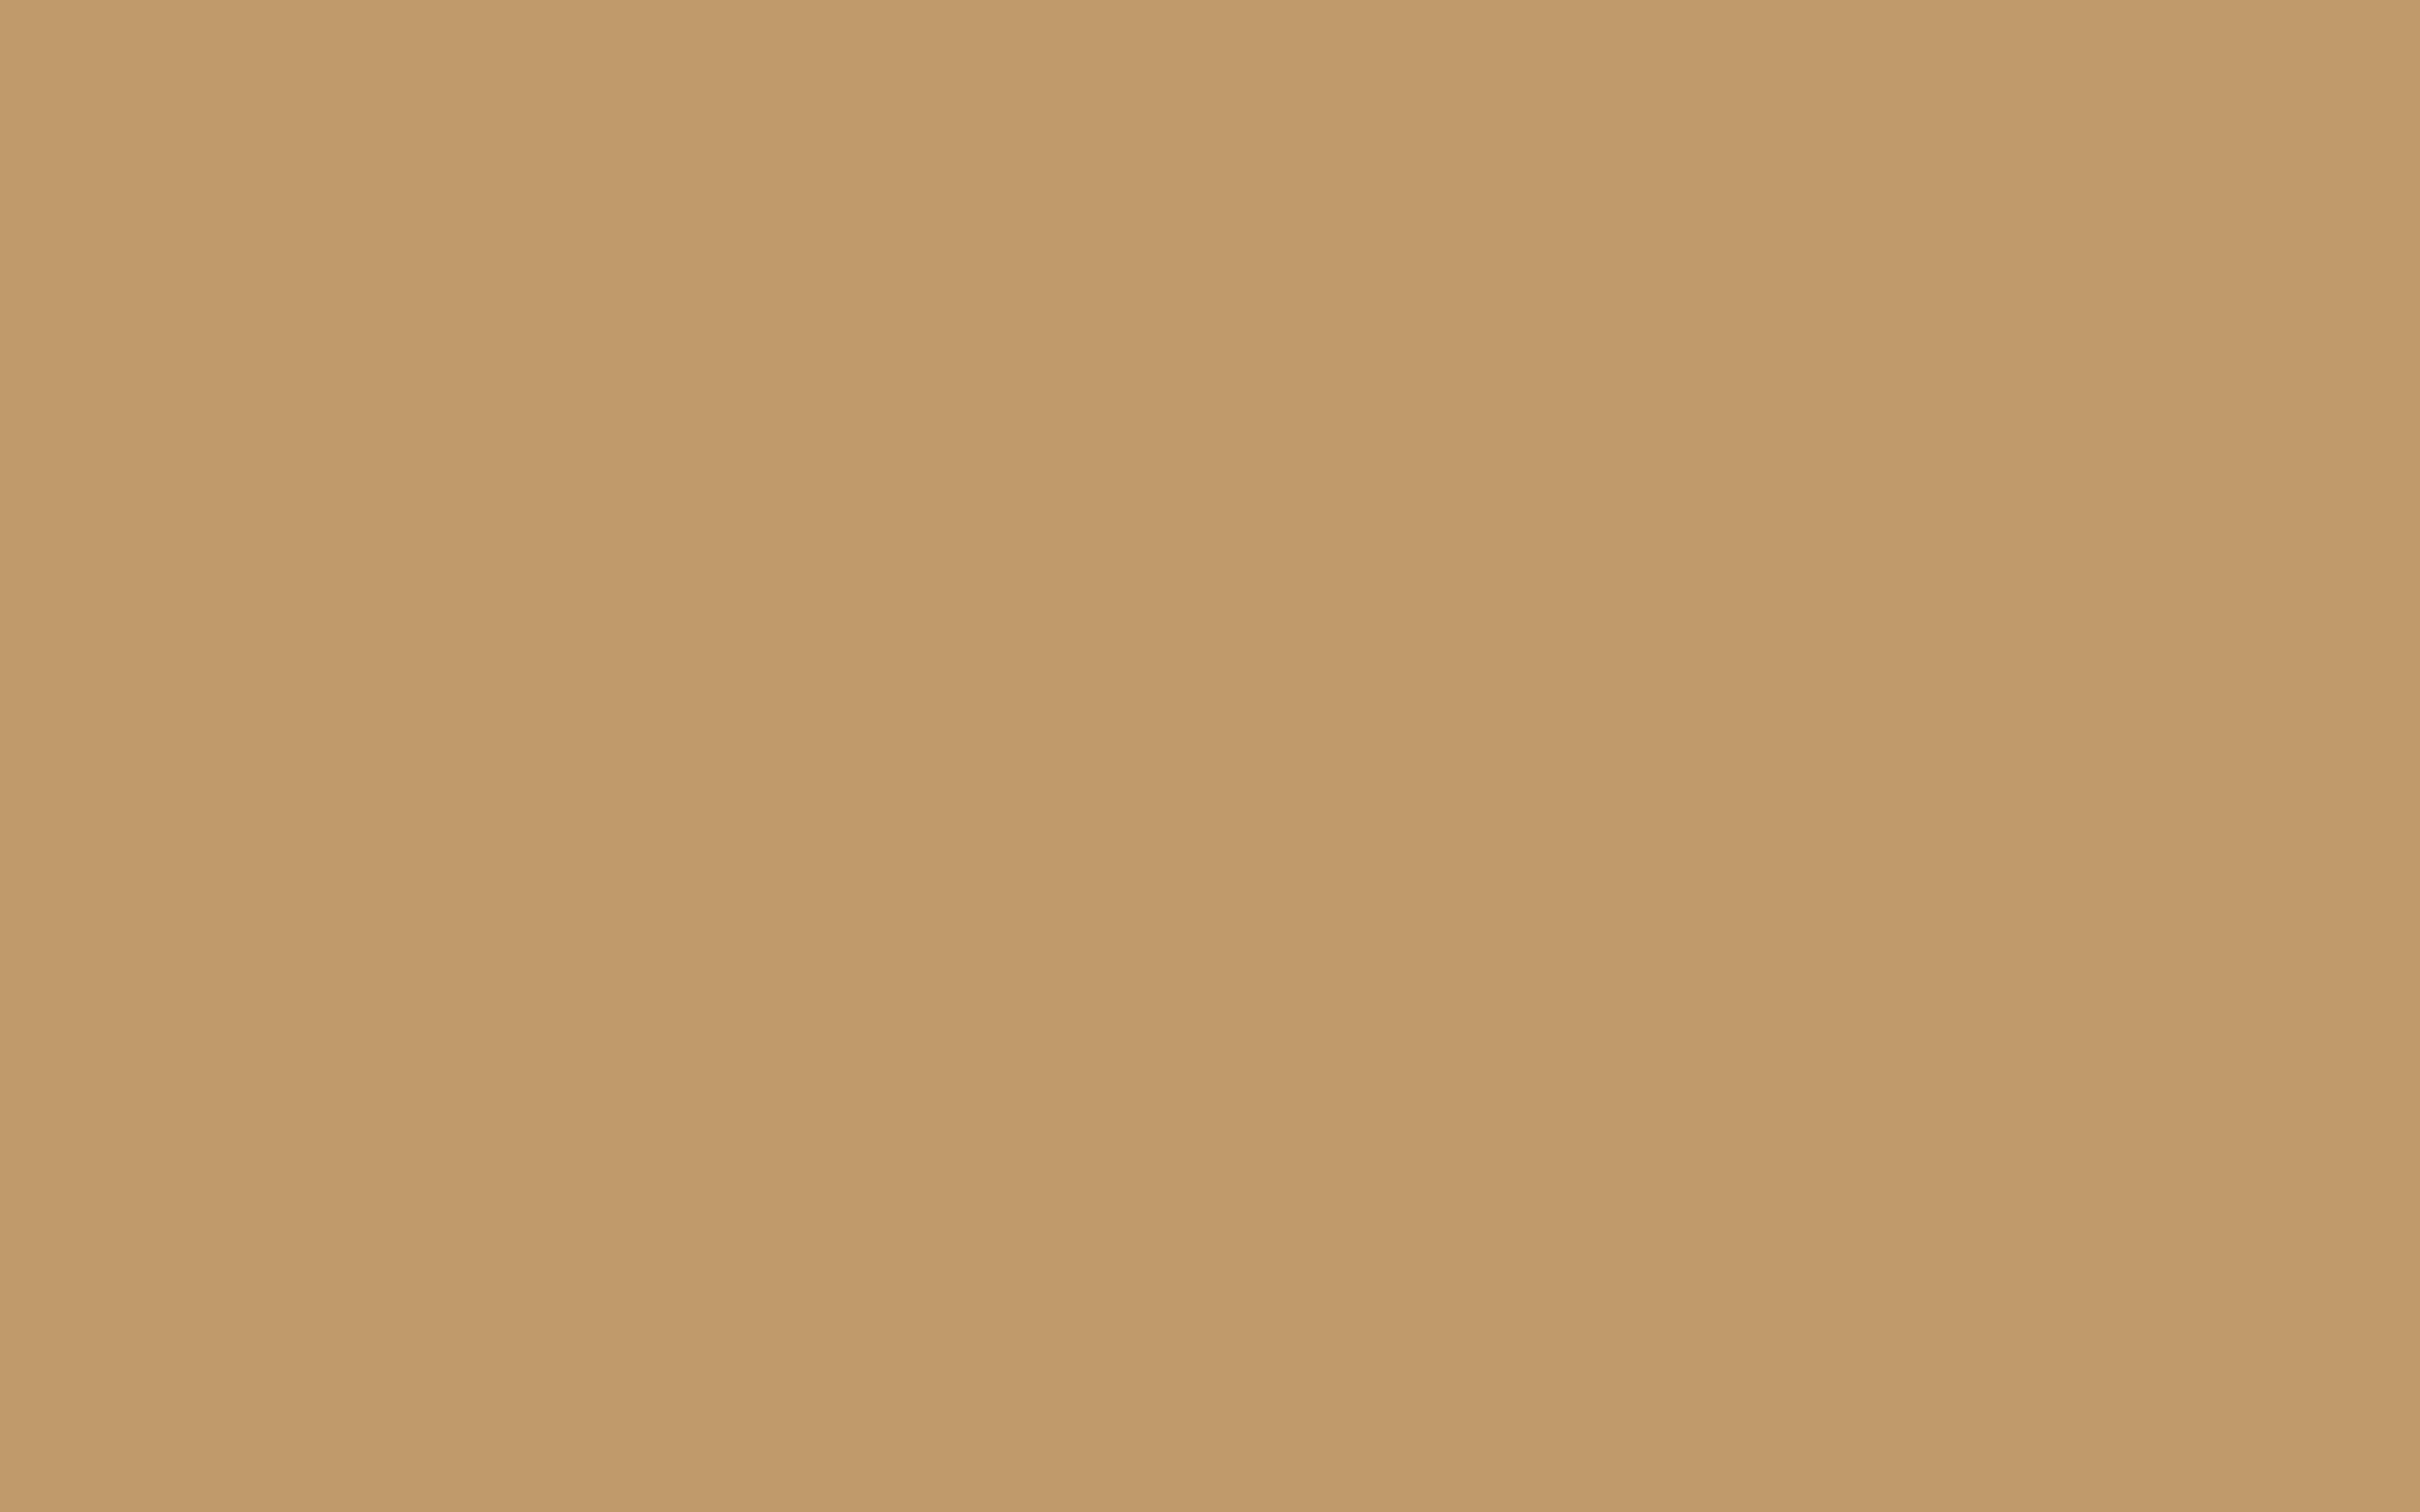 2560x1600 Desert Solid Color Background